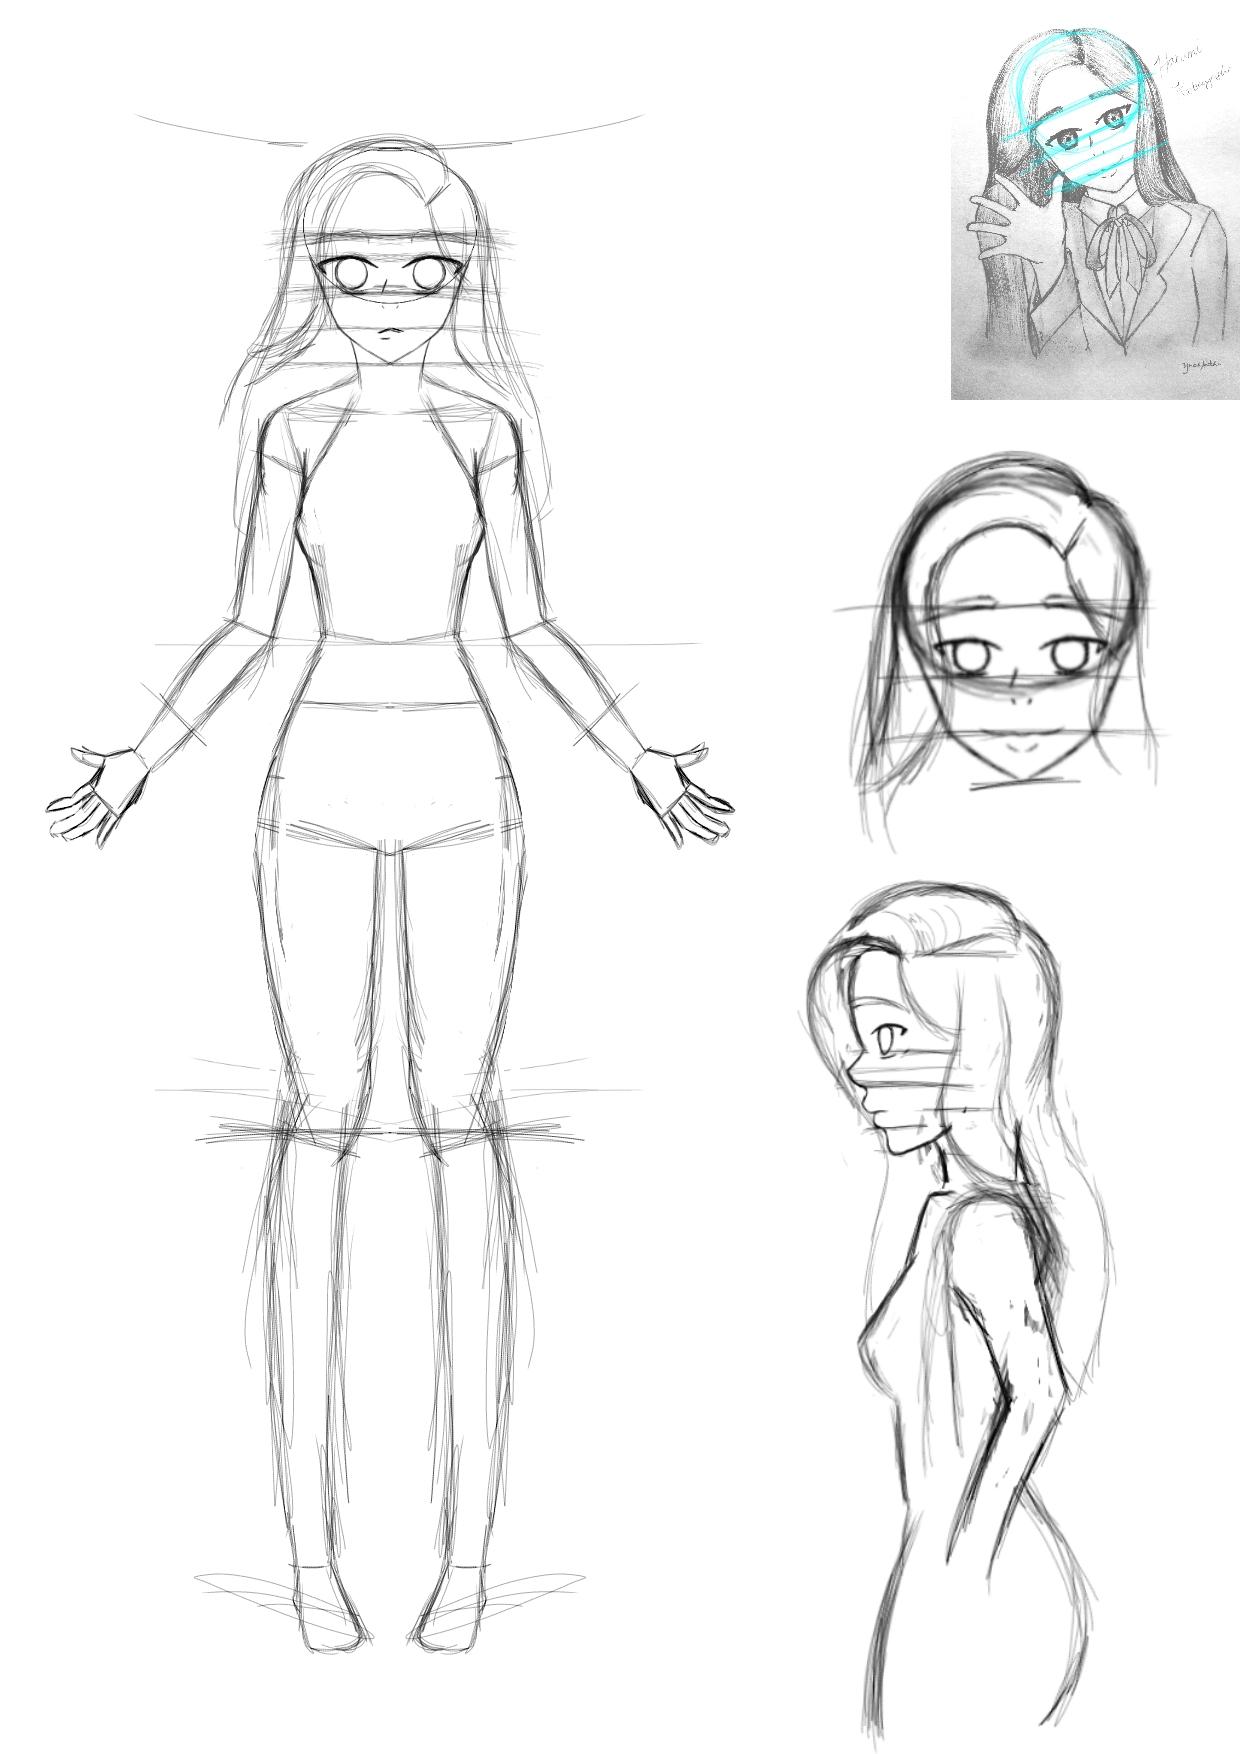 002_Manga_BodySketch.jpg